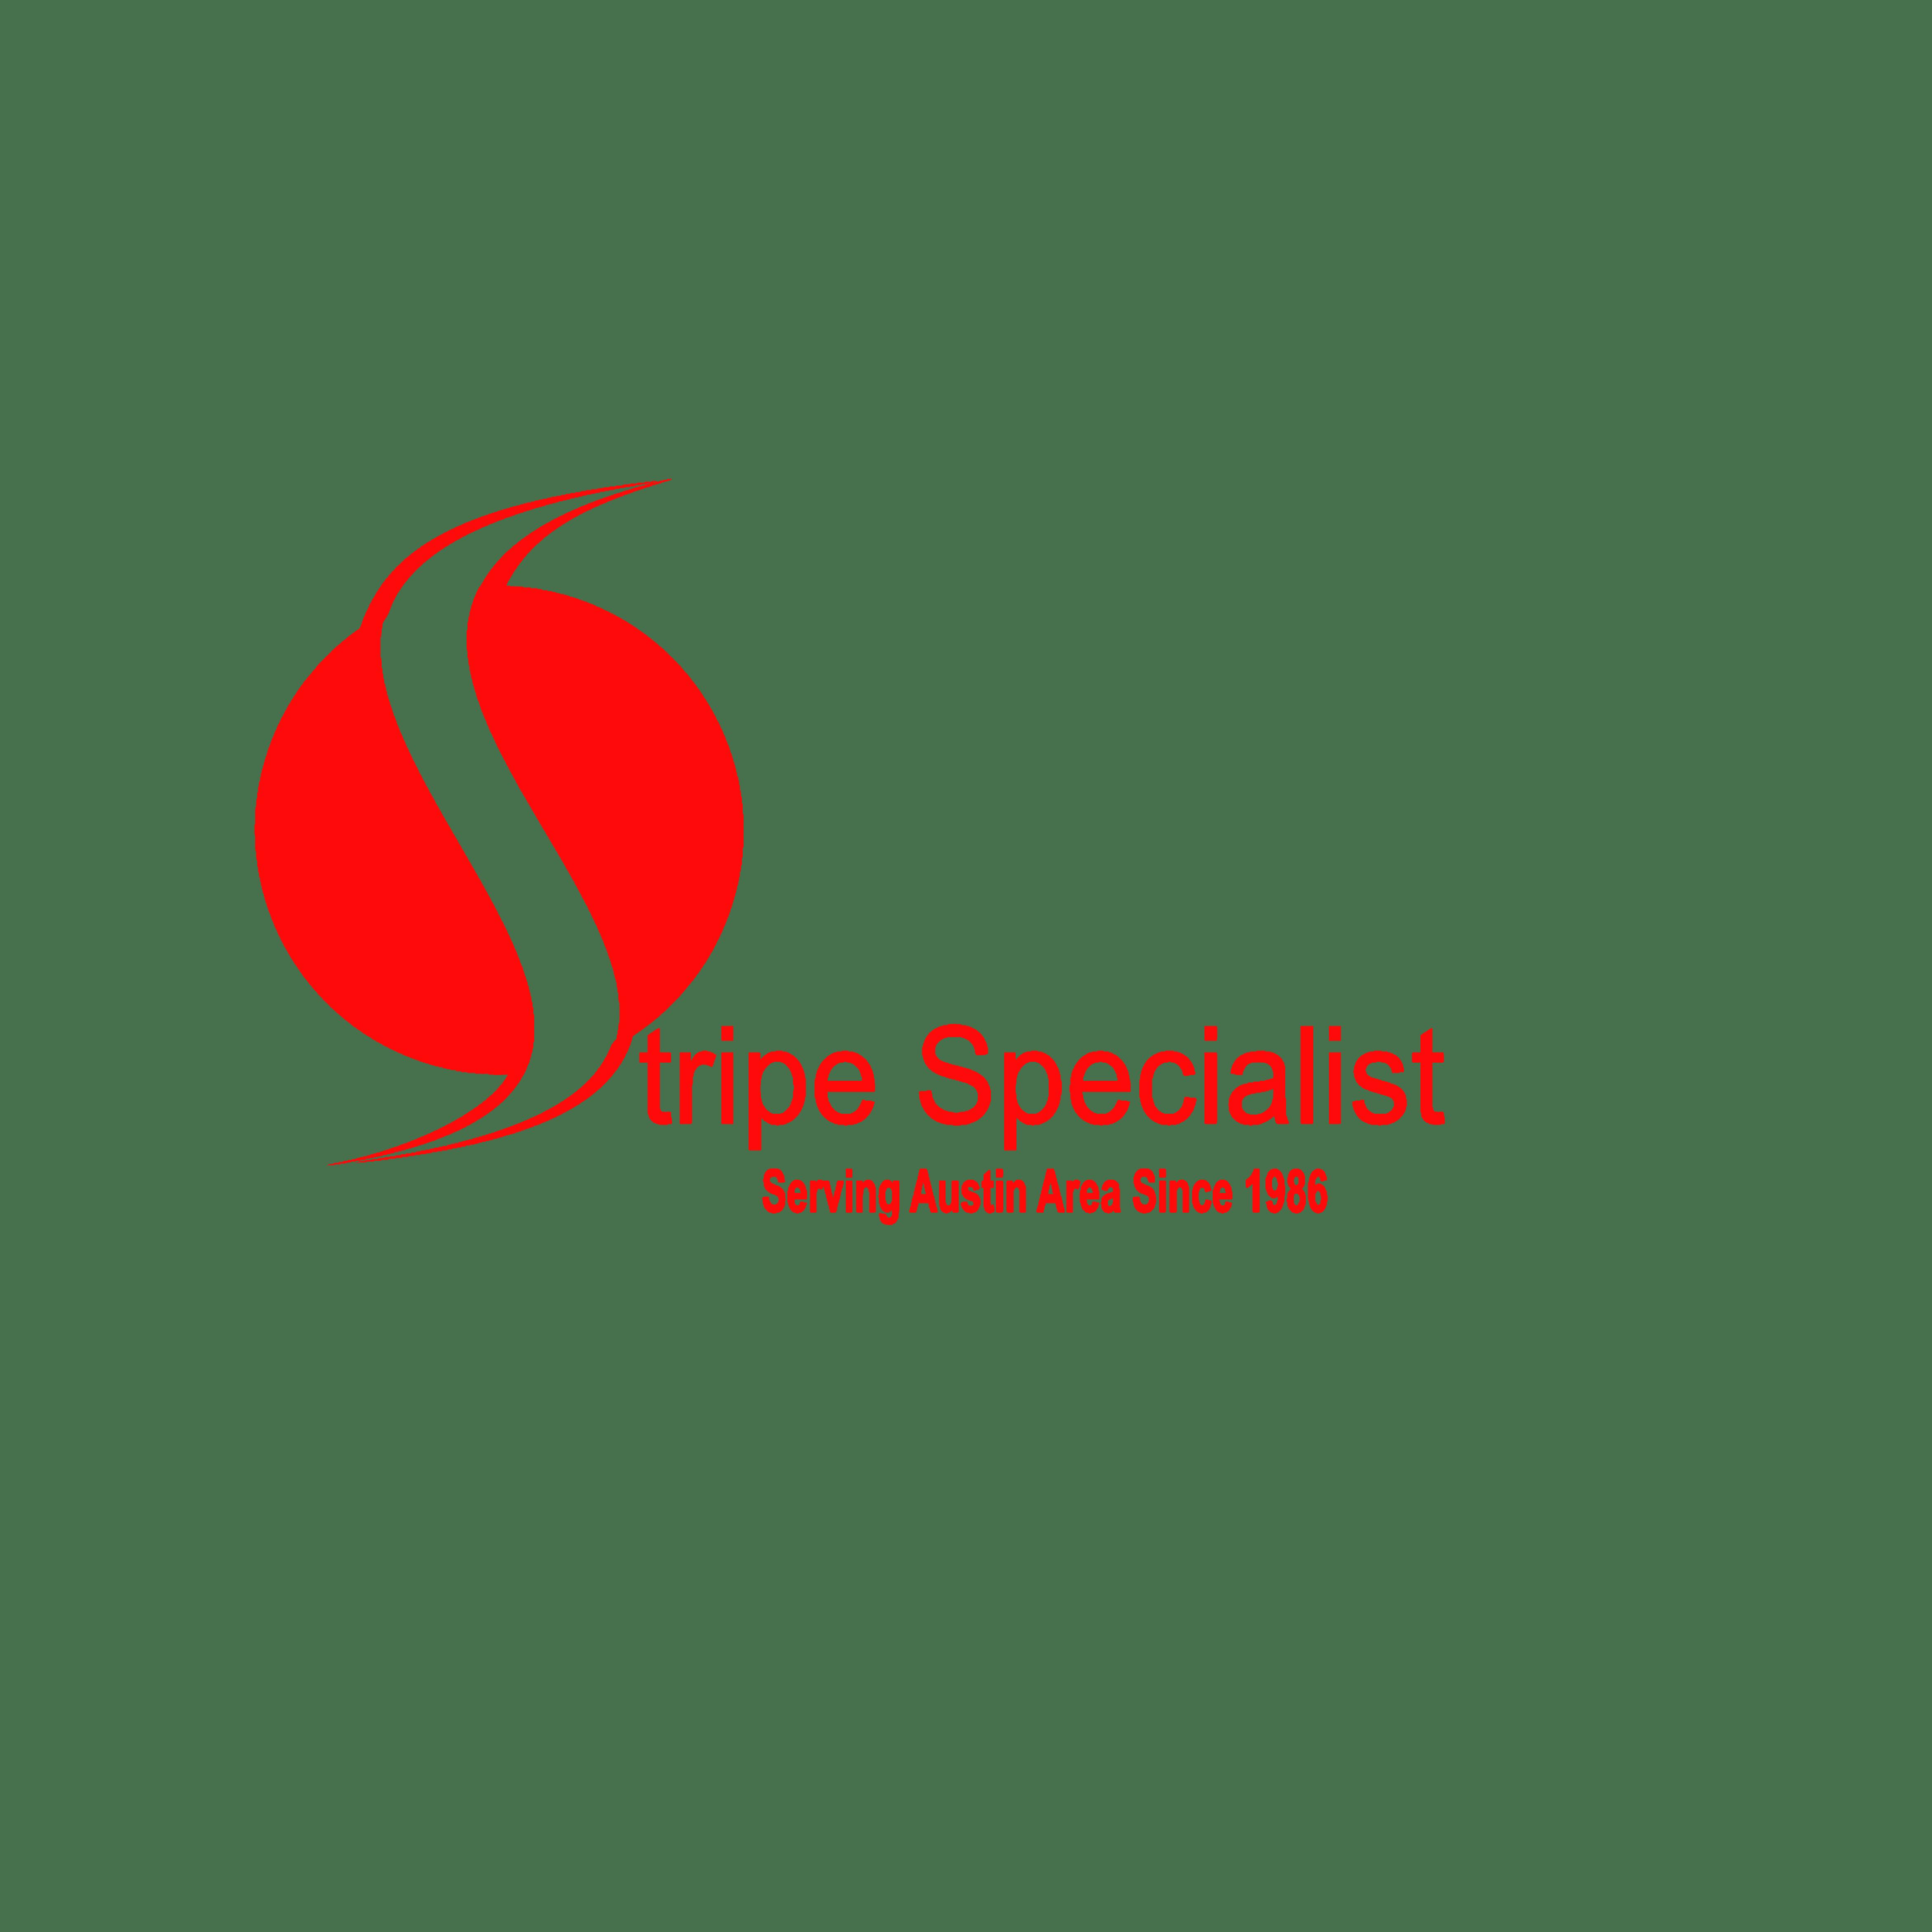 Stripe Specialist